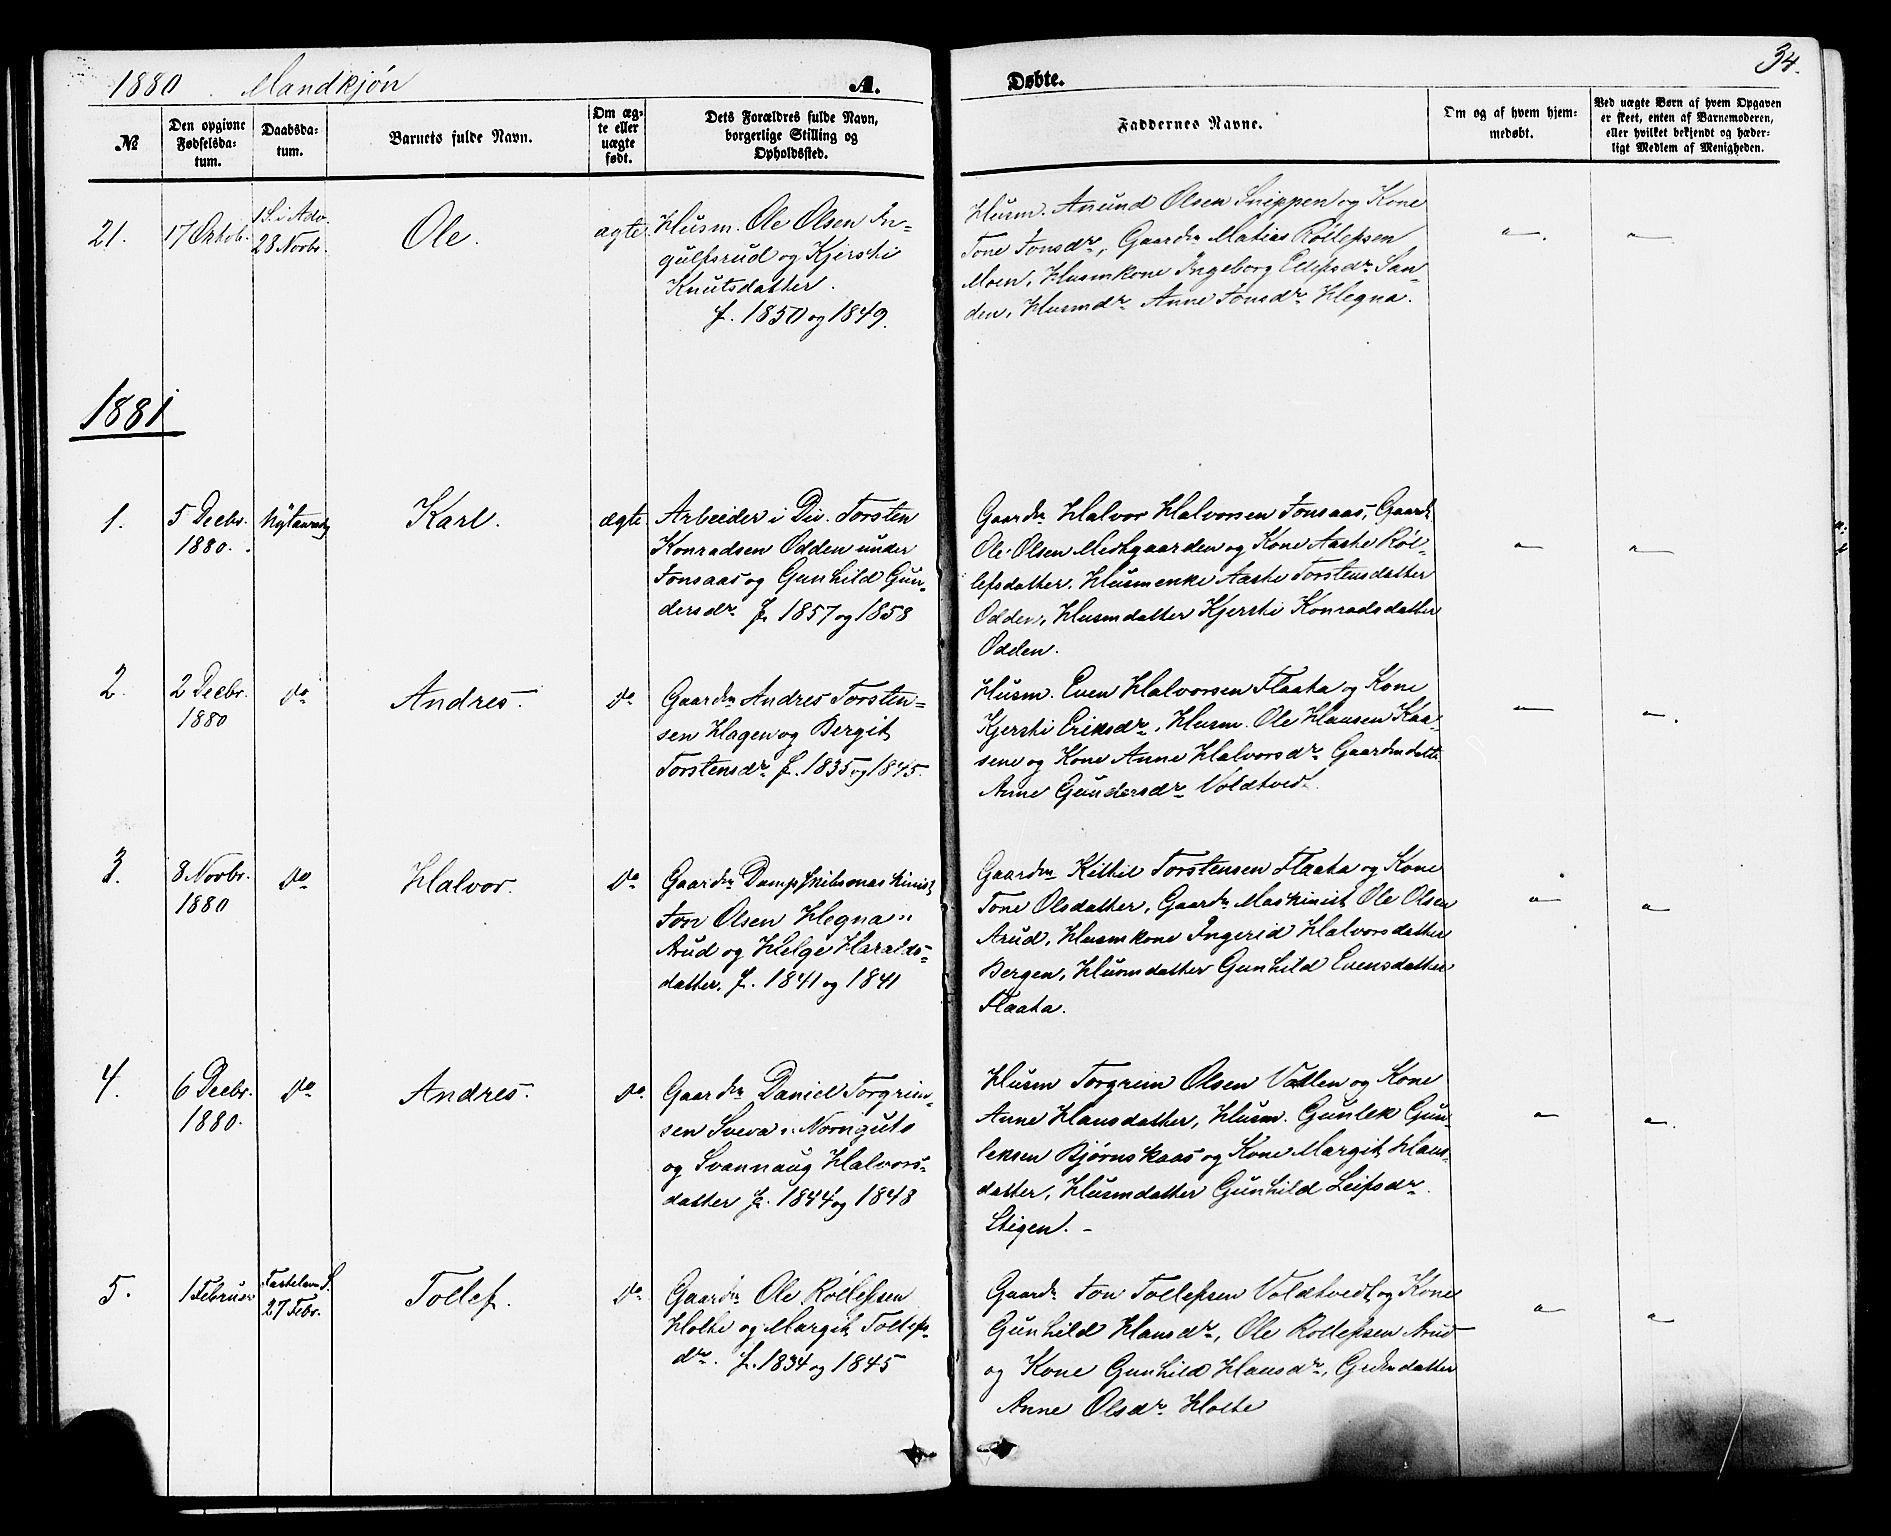 SAKO, Sauherad kirkebøker, F/Fa/L0008: Ministerialbok nr. I 8, 1873-1886, s. 34